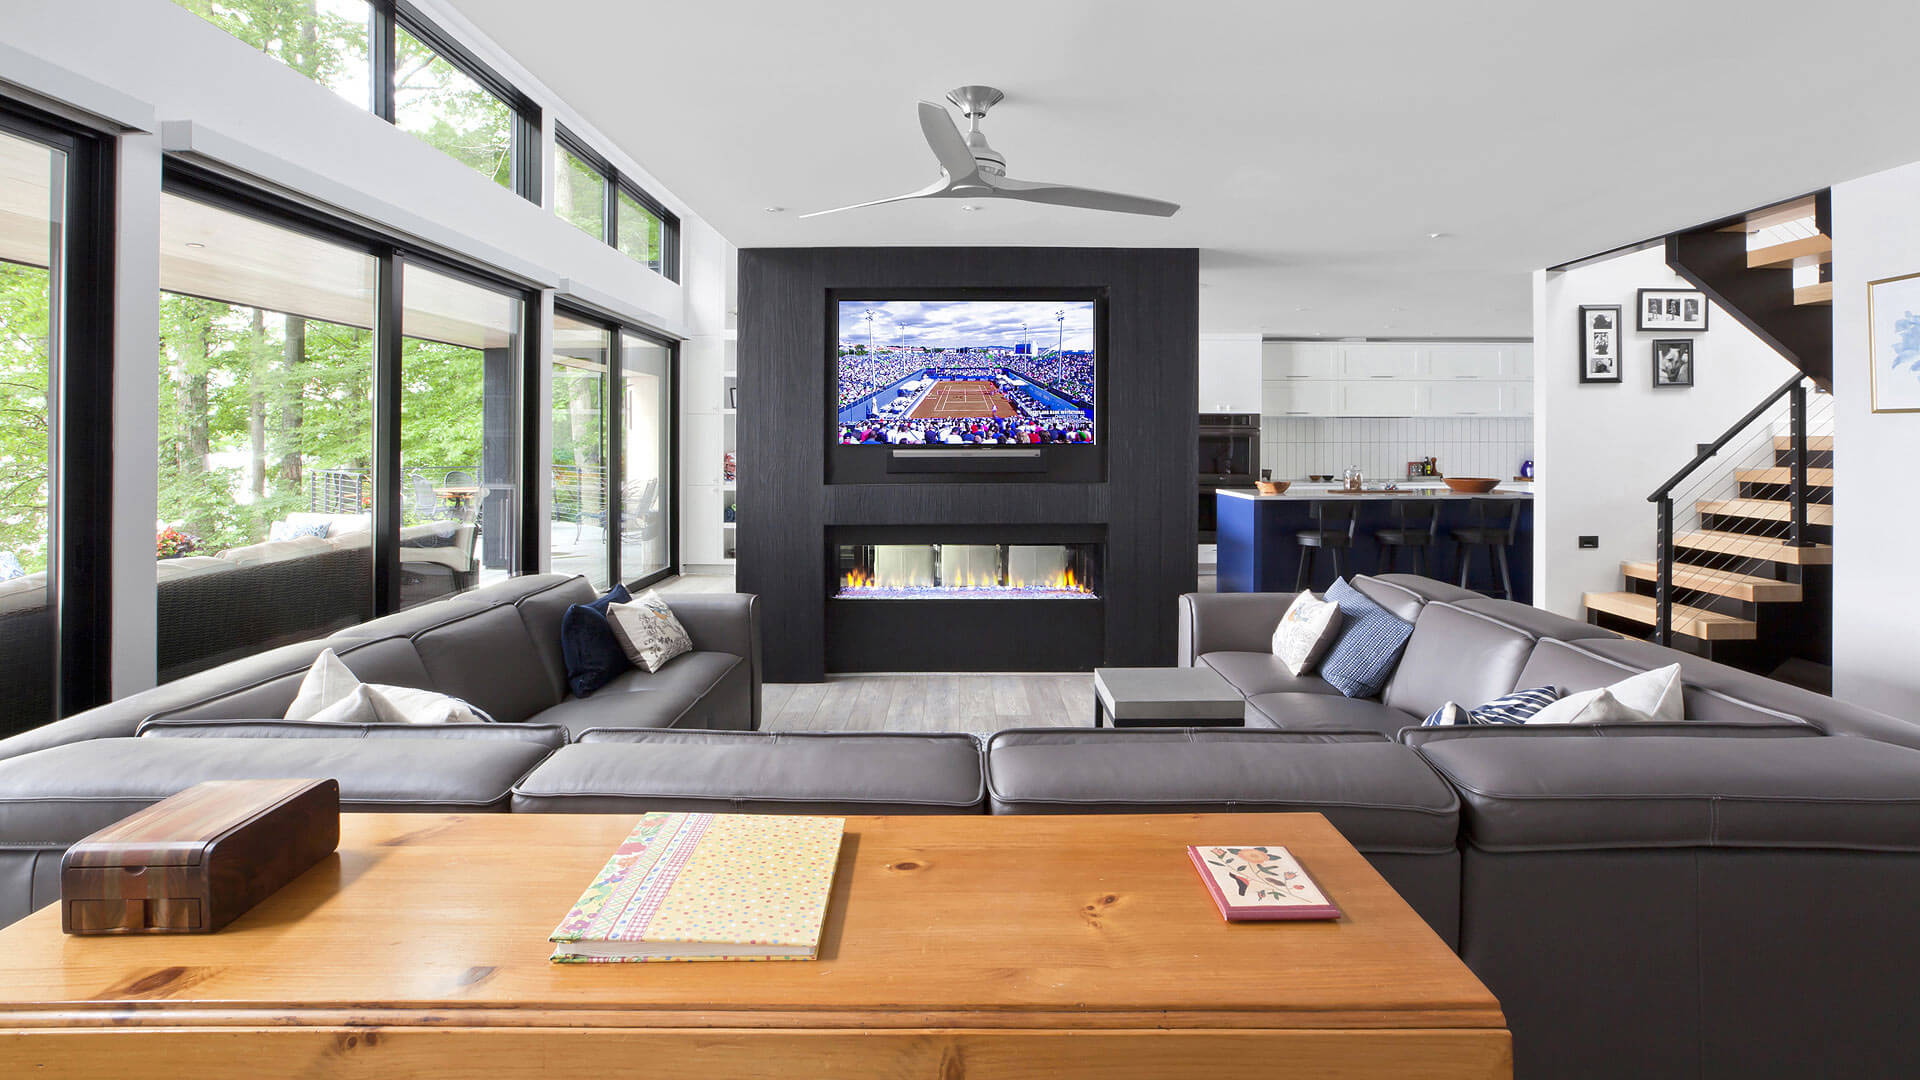 Open Concept Living + Dining + Kitchen - Lakeside Modern Cottage (H-LODGE) - Unionville, Indiana - Lake Lemon